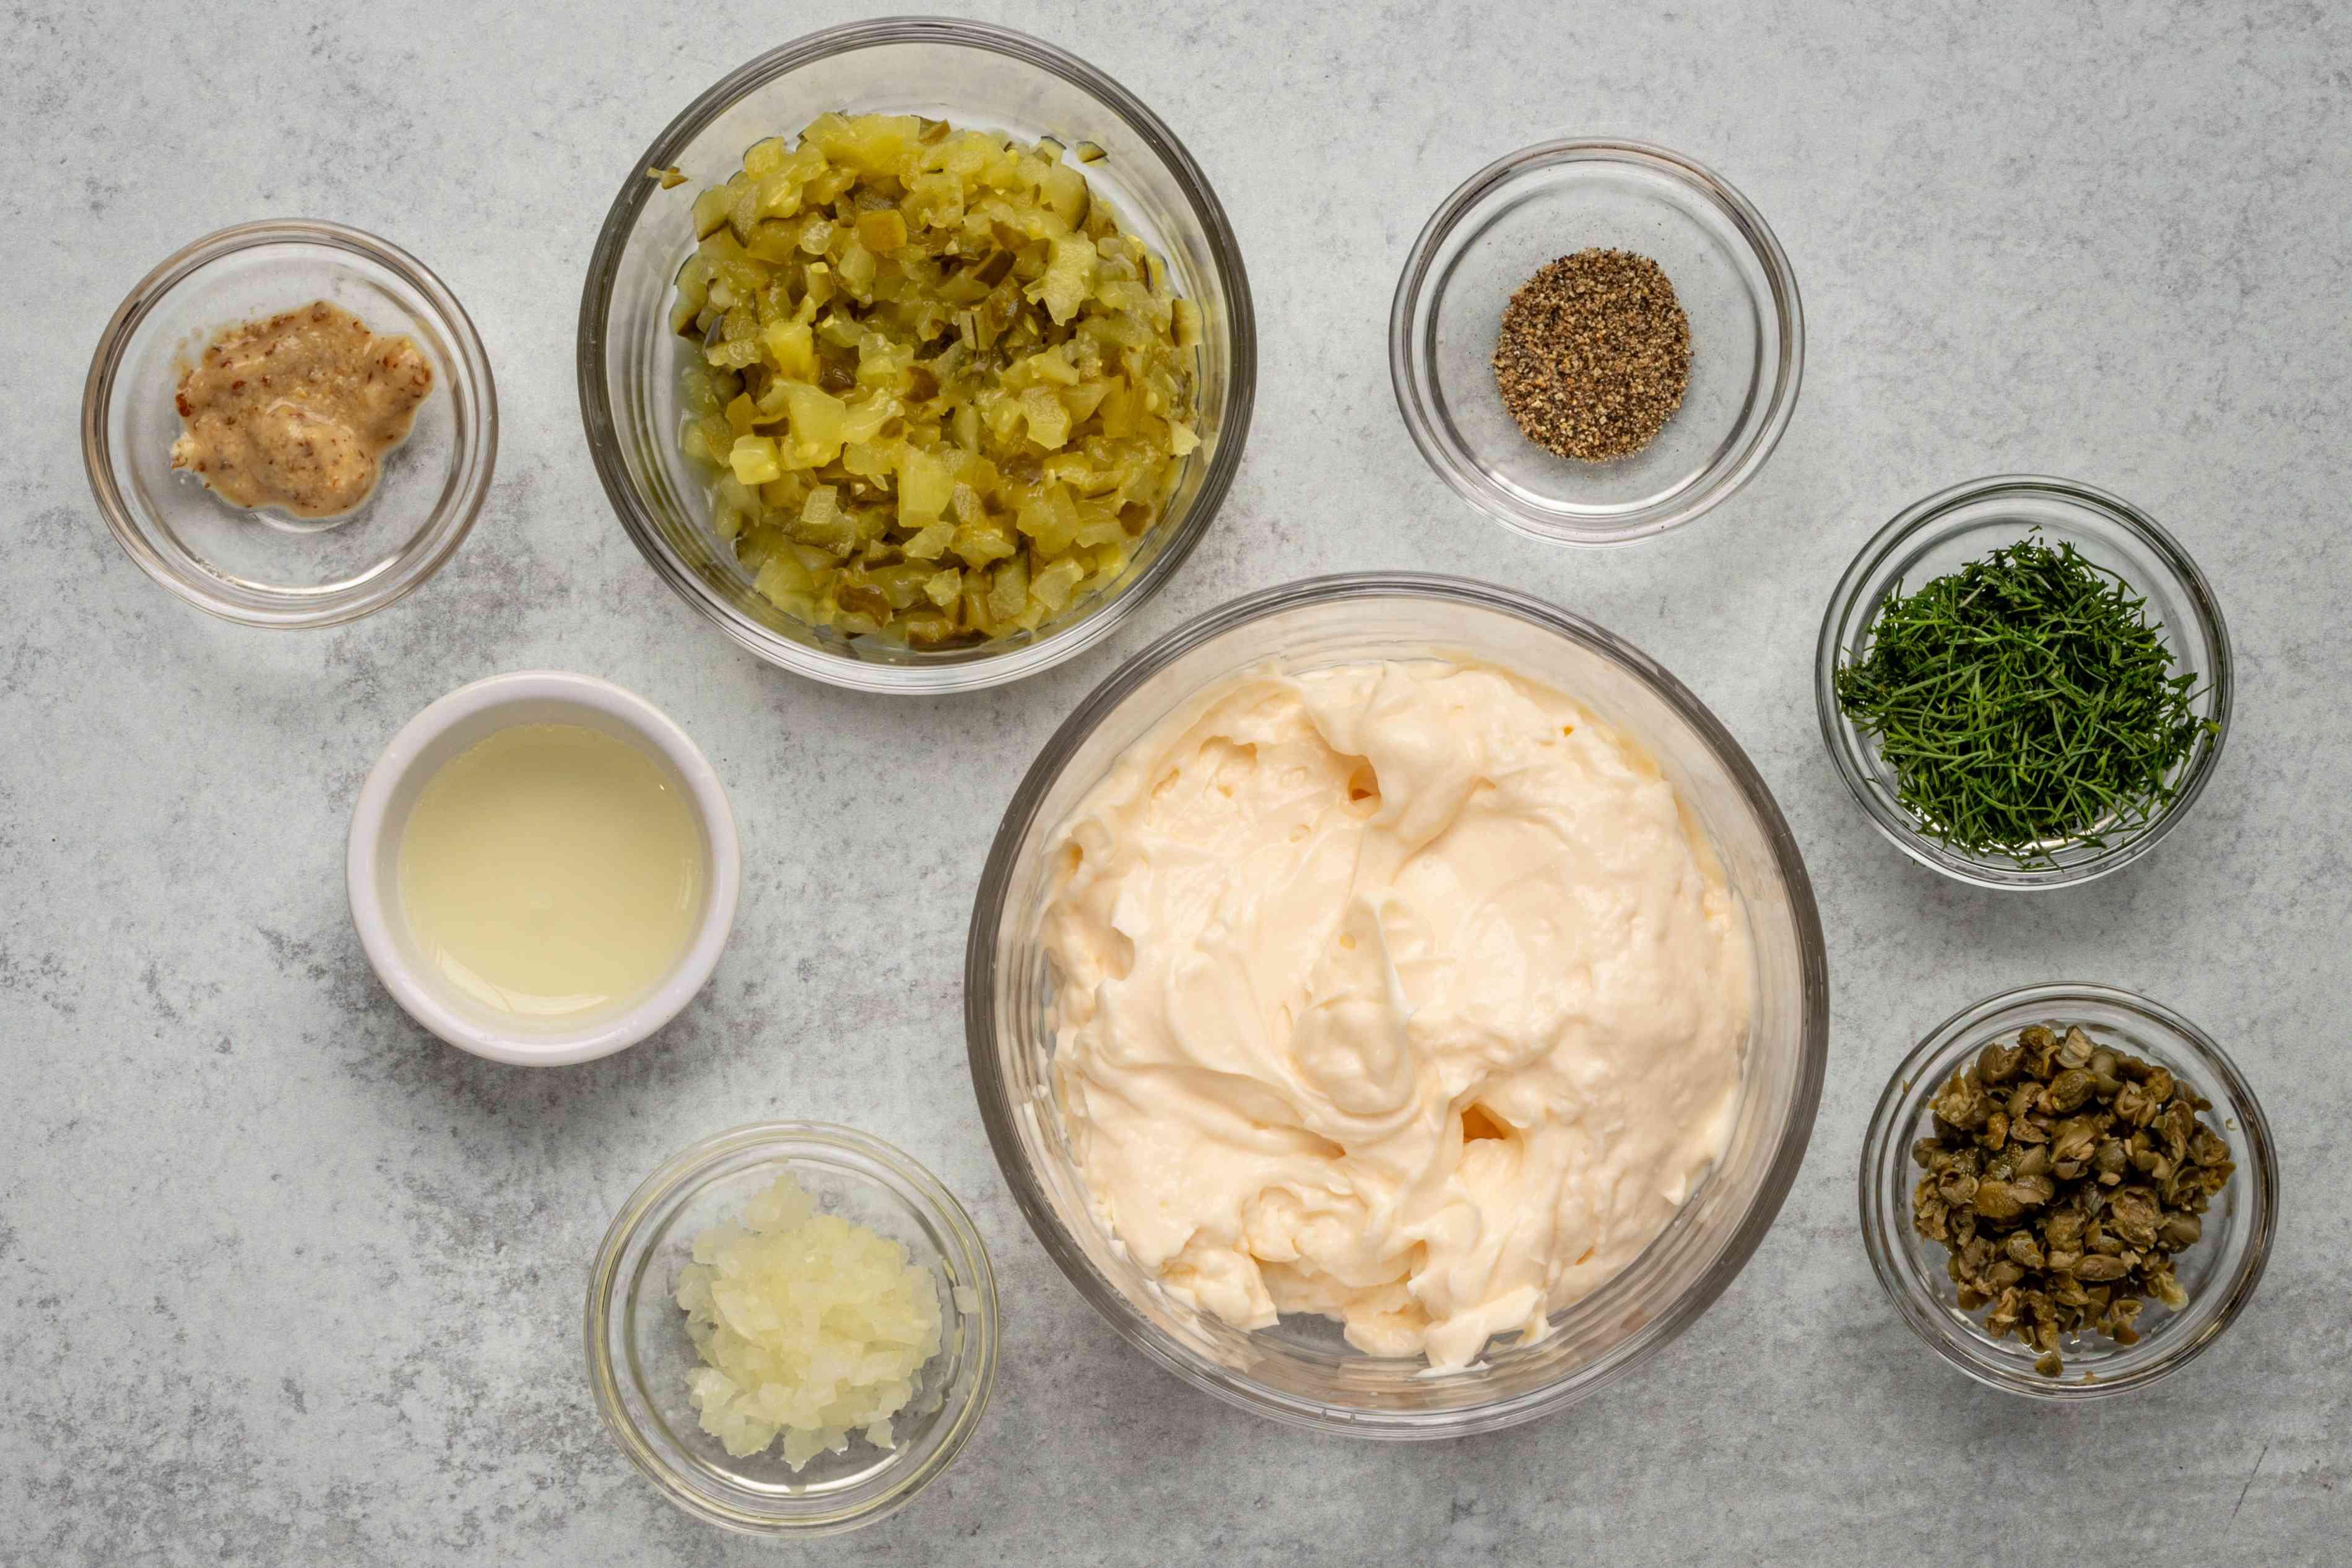 Ingredients for homemade tartar sauce